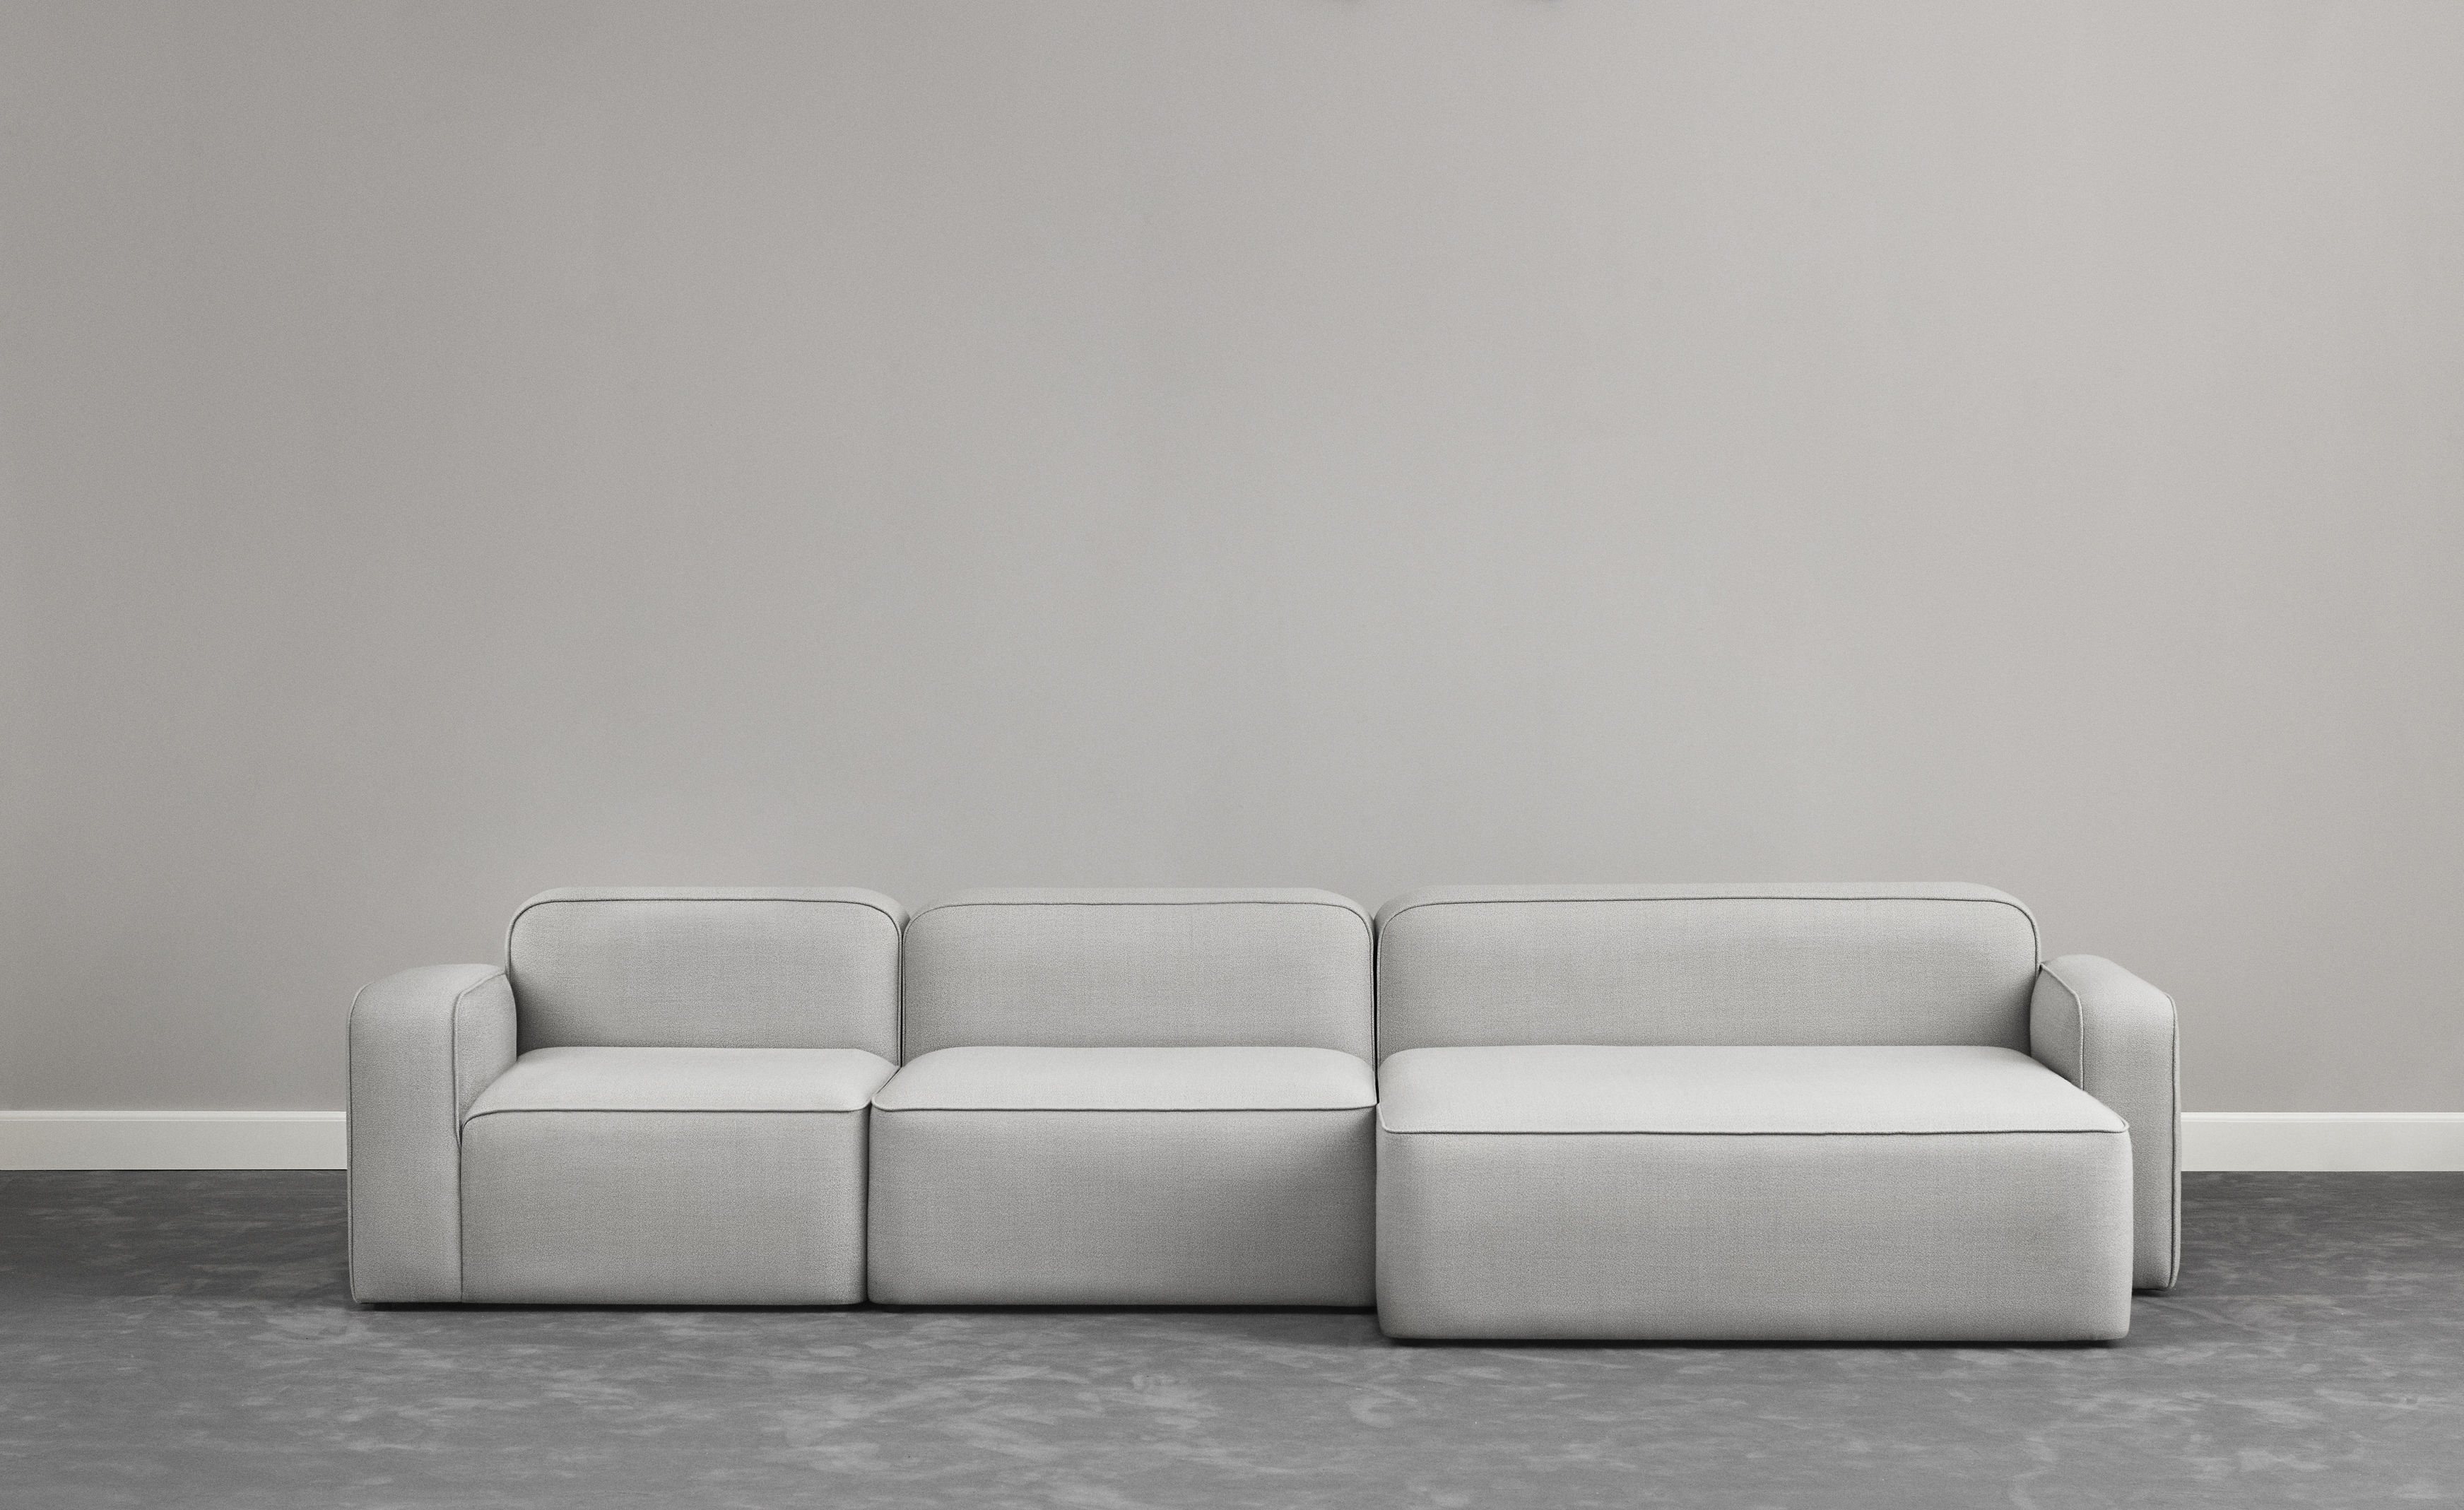 rope modular sofa open left side l 120 cm light grey by normann copenhagen. Black Bedroom Furniture Sets. Home Design Ideas